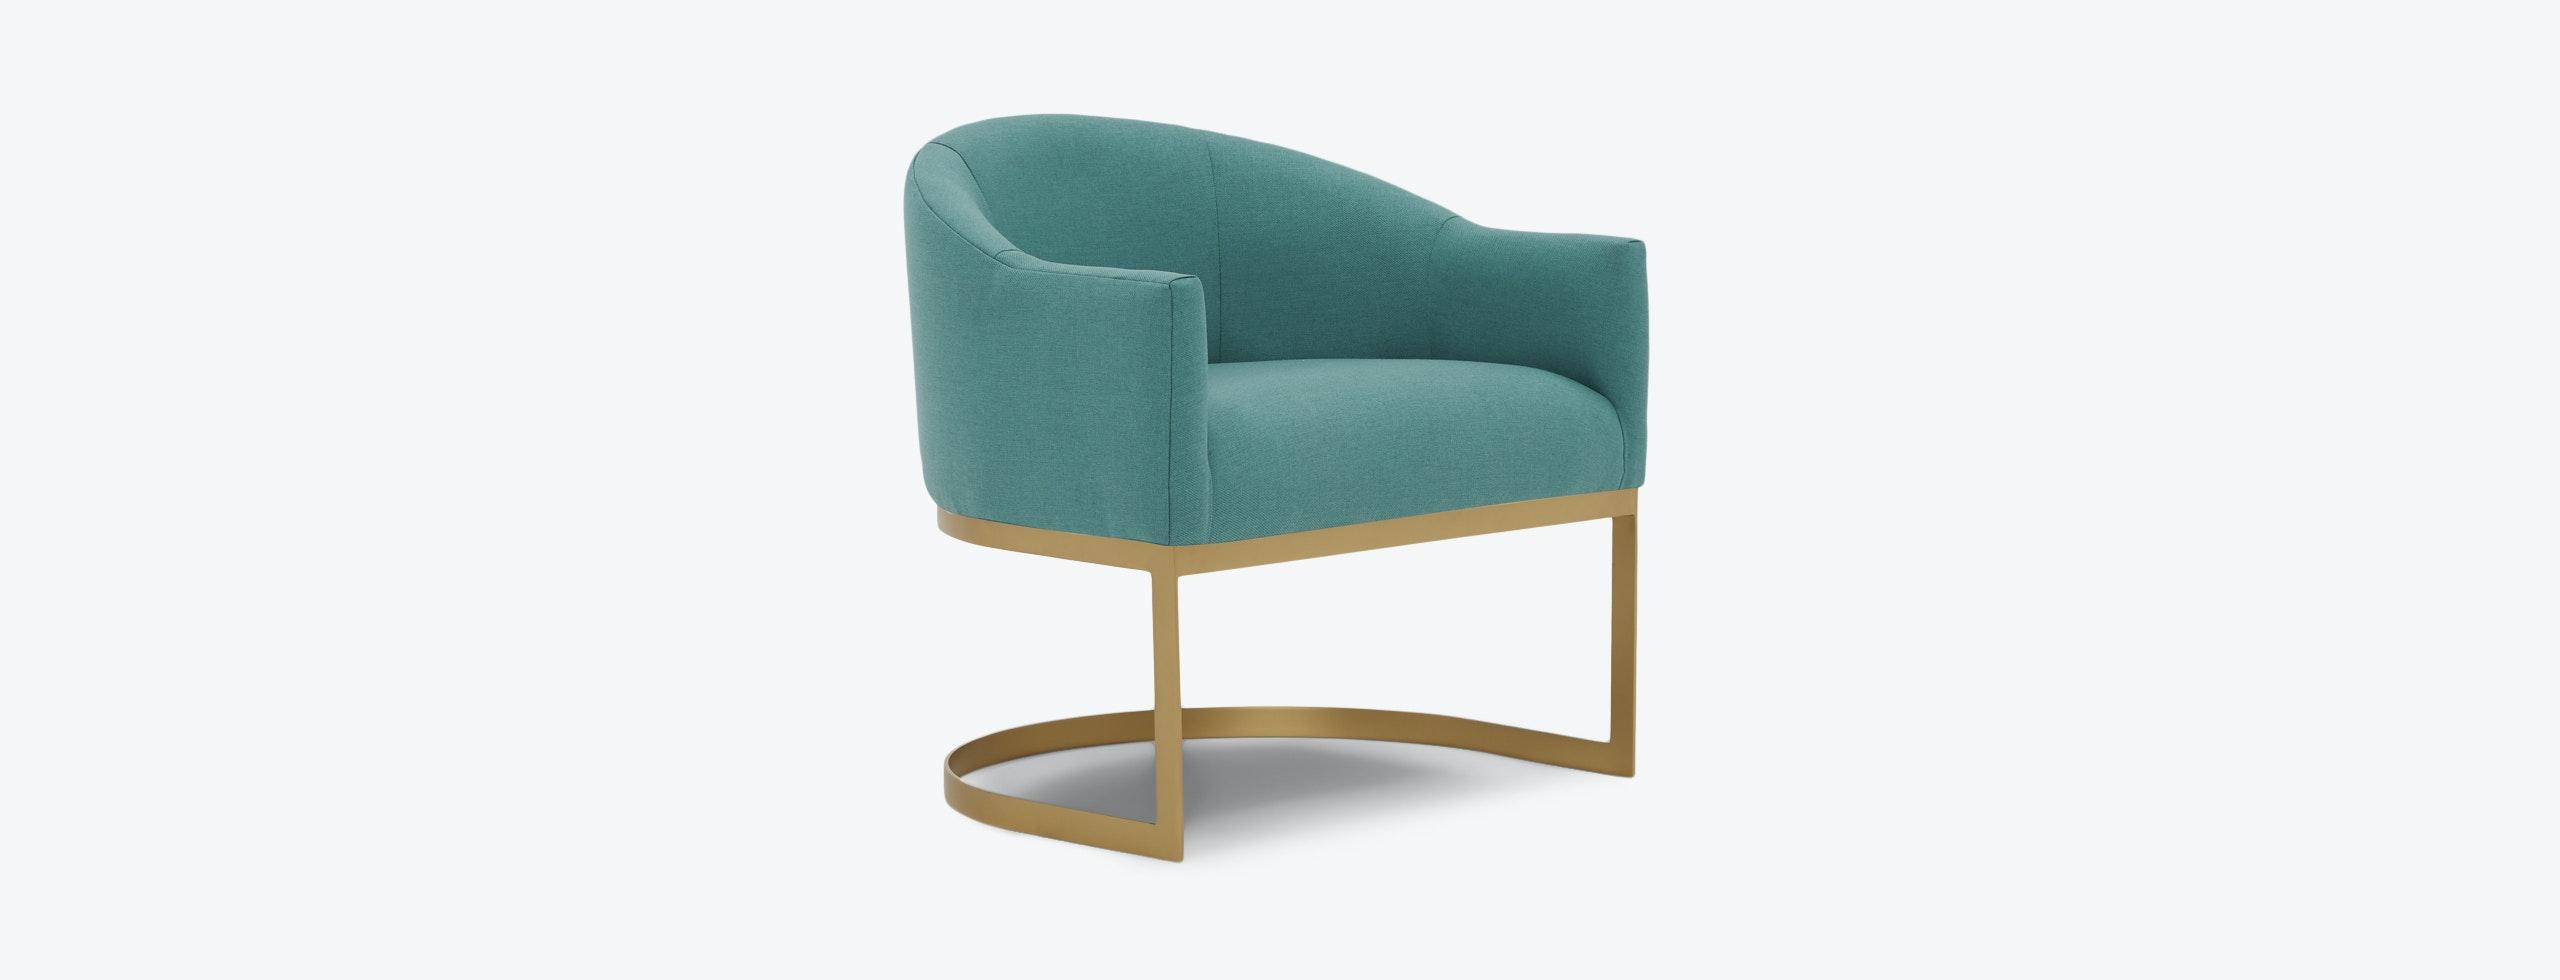 Fantastic Jolie Accent Chair Evergreenethics Interior Chair Design Evergreenethicsorg